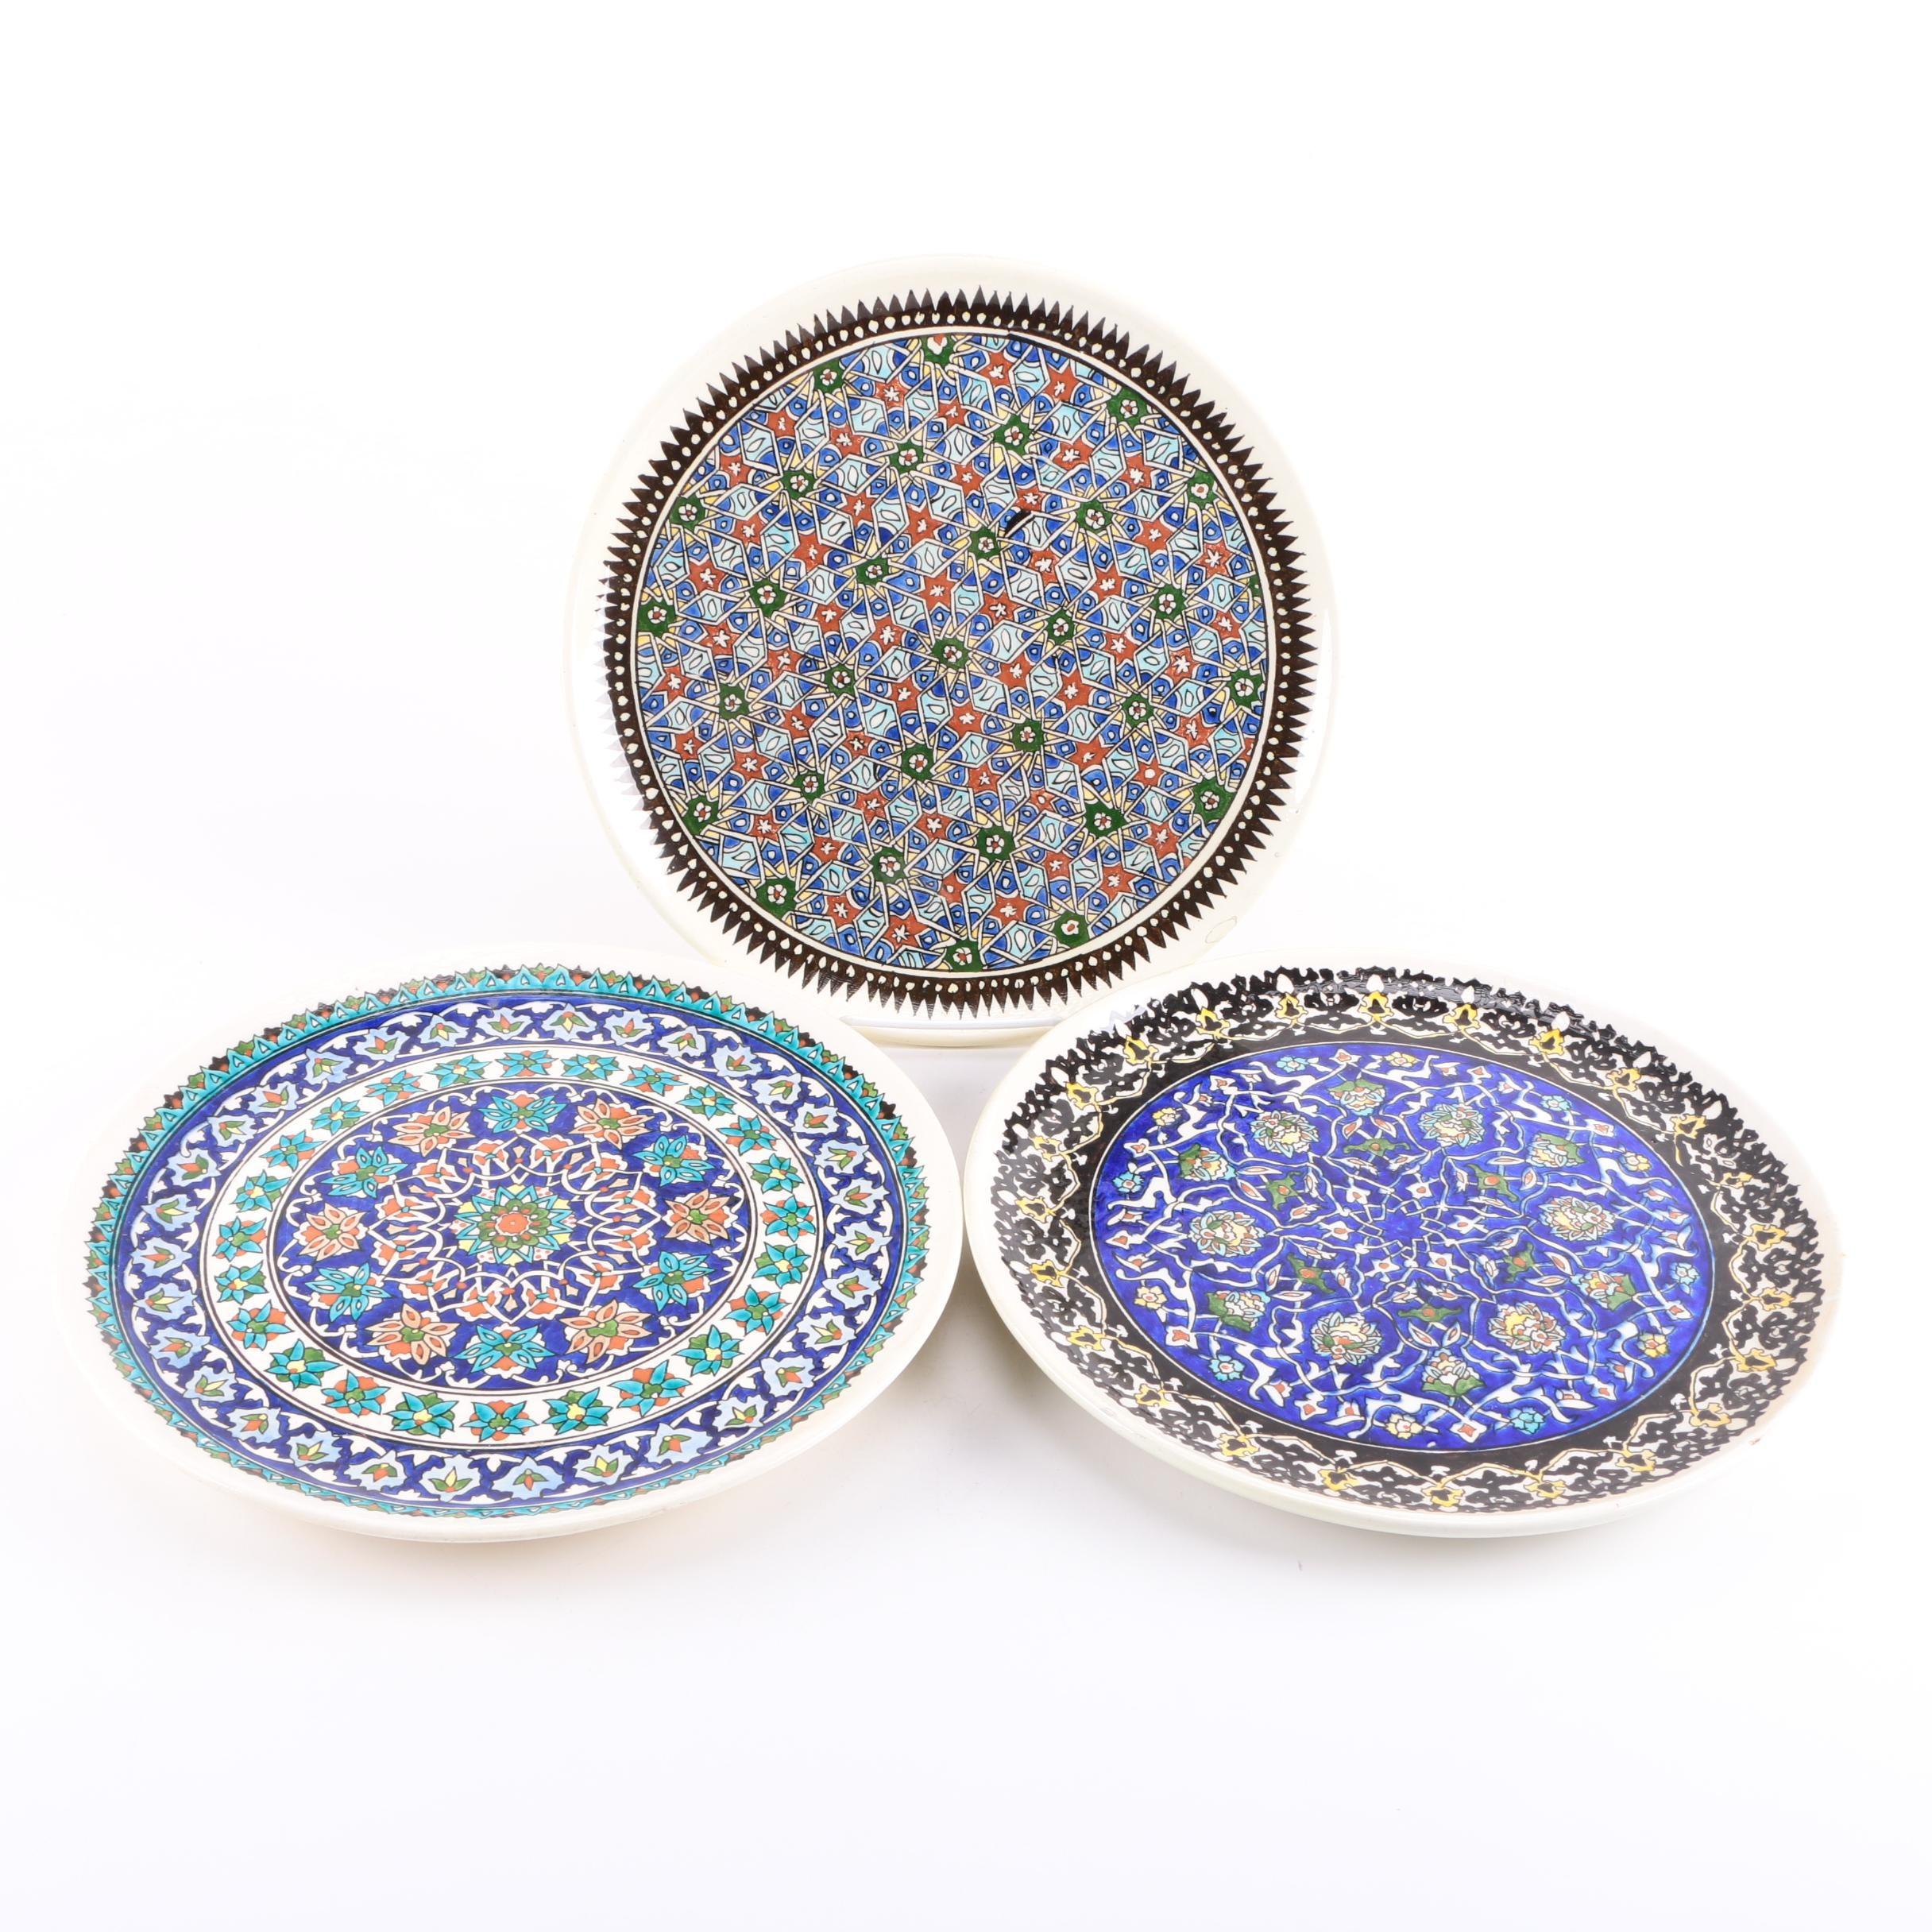 Guven Cini Turkish Hand-Painted Kutahya Pottery Decorative Plates ...  sc 1 st  EBTH.com & Guven Cini Turkish Hand-Painted Kutahya Pottery Decorative Plates : EBTH